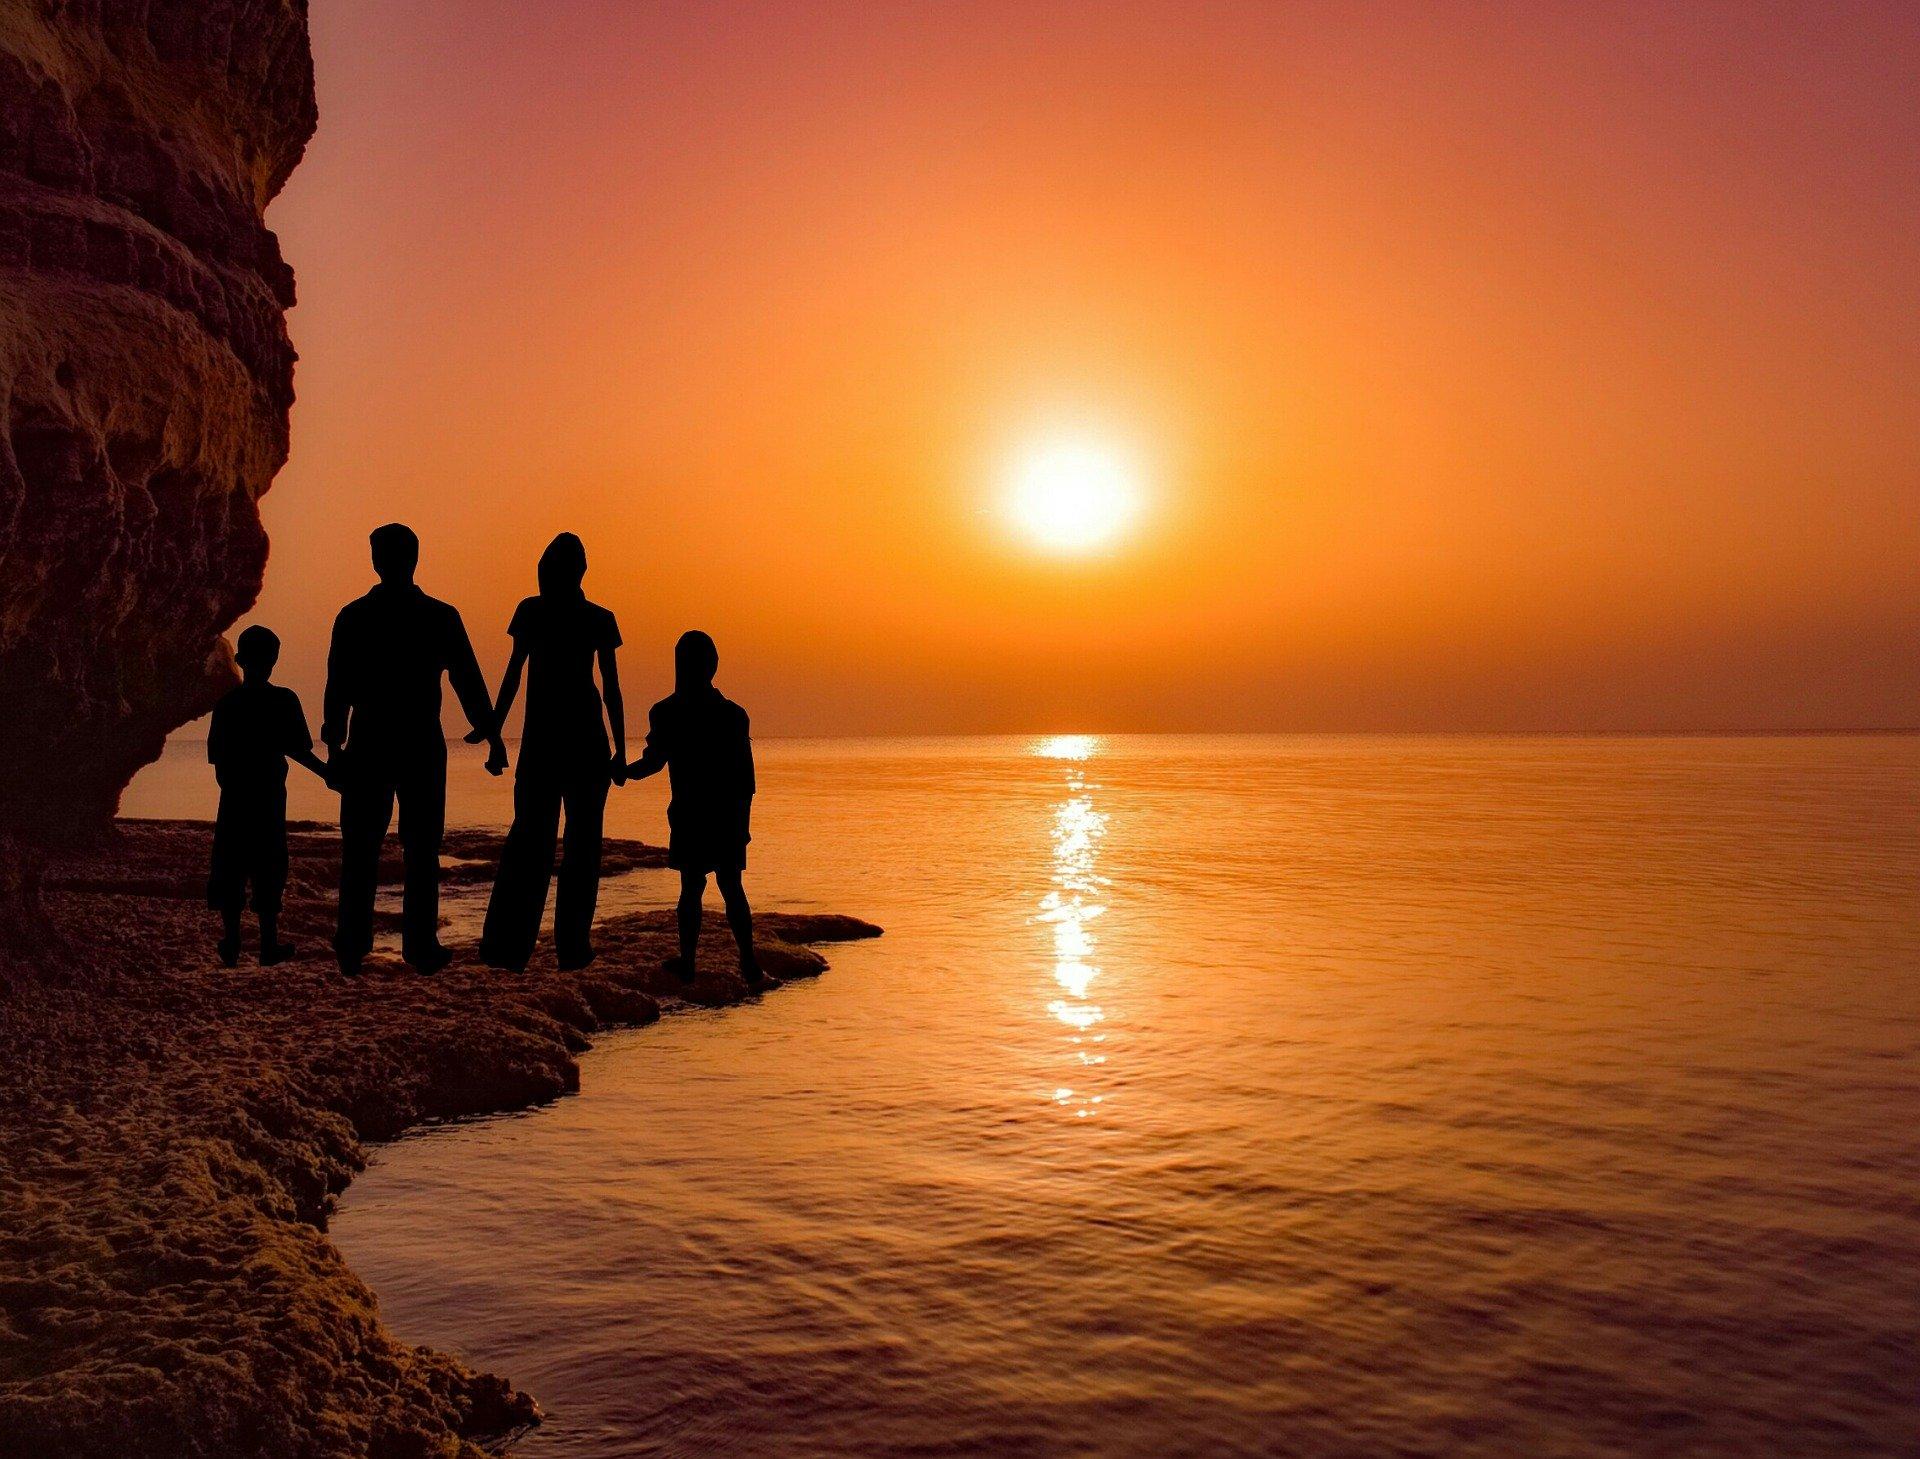 sunset-3309764_1920